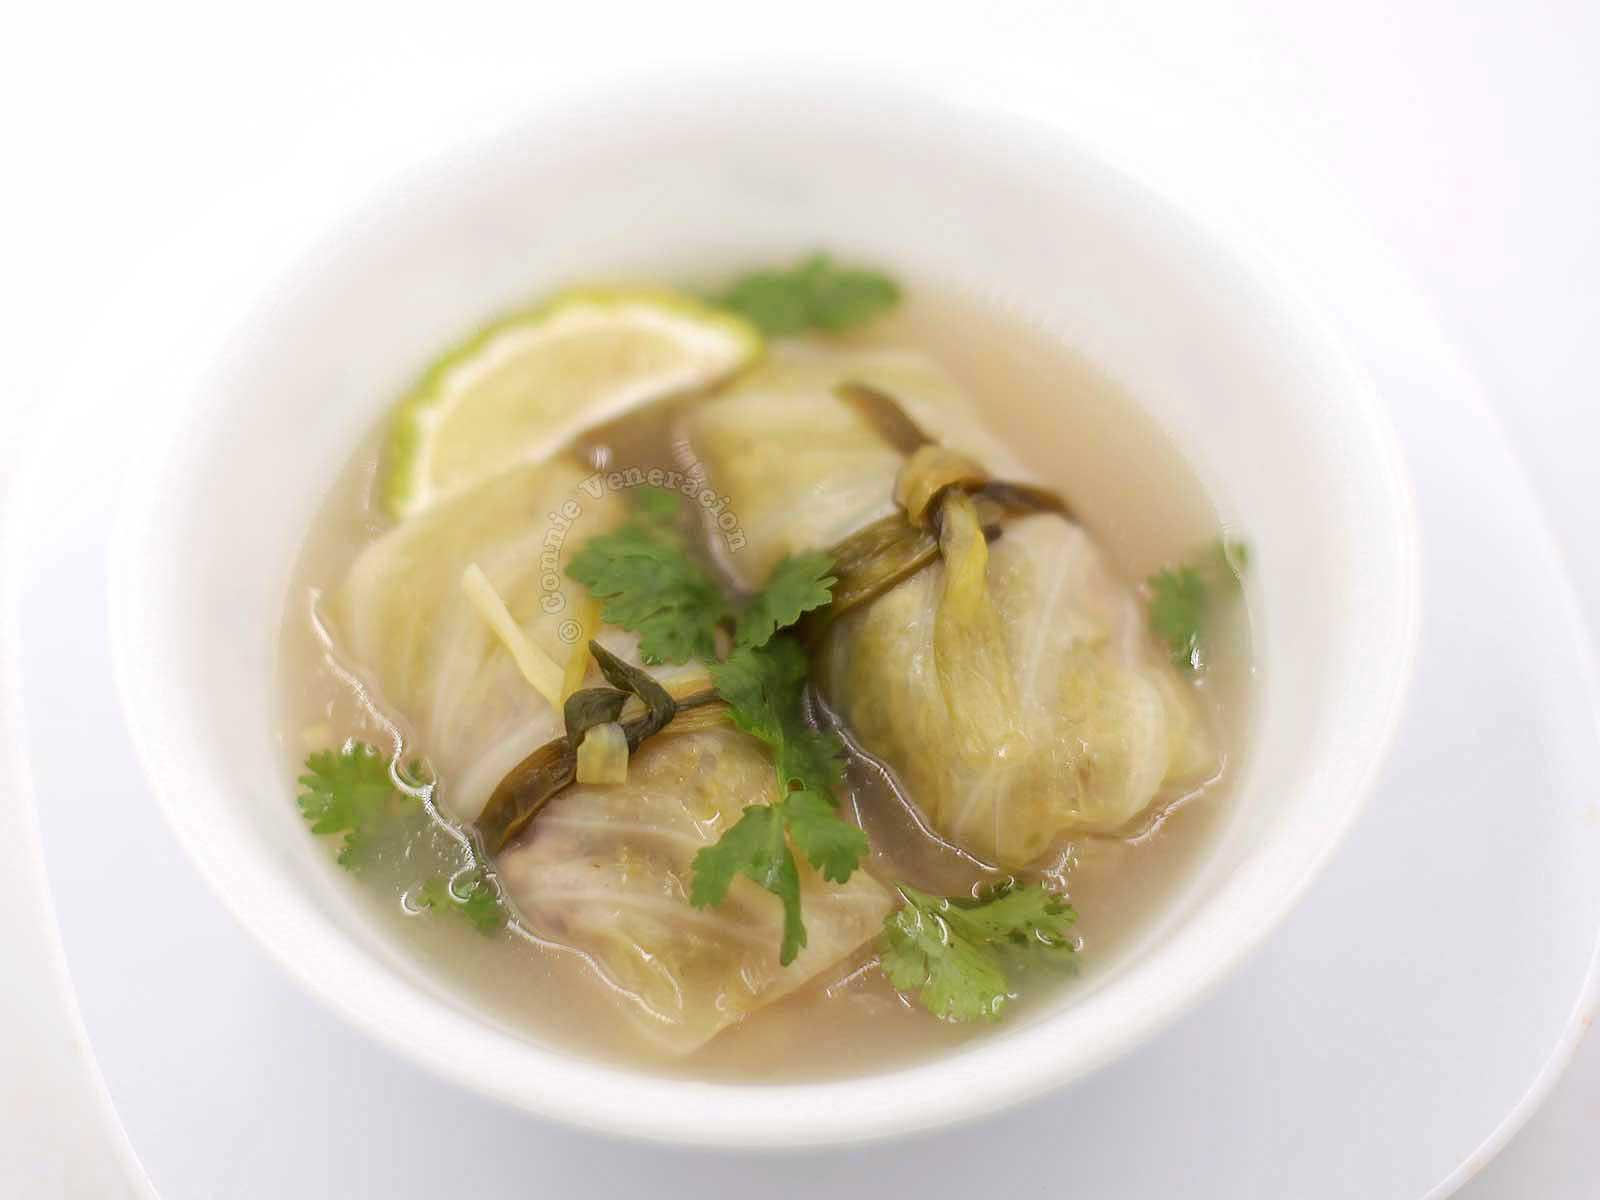 Pork-stuffed cabbage rolls, Thai-style